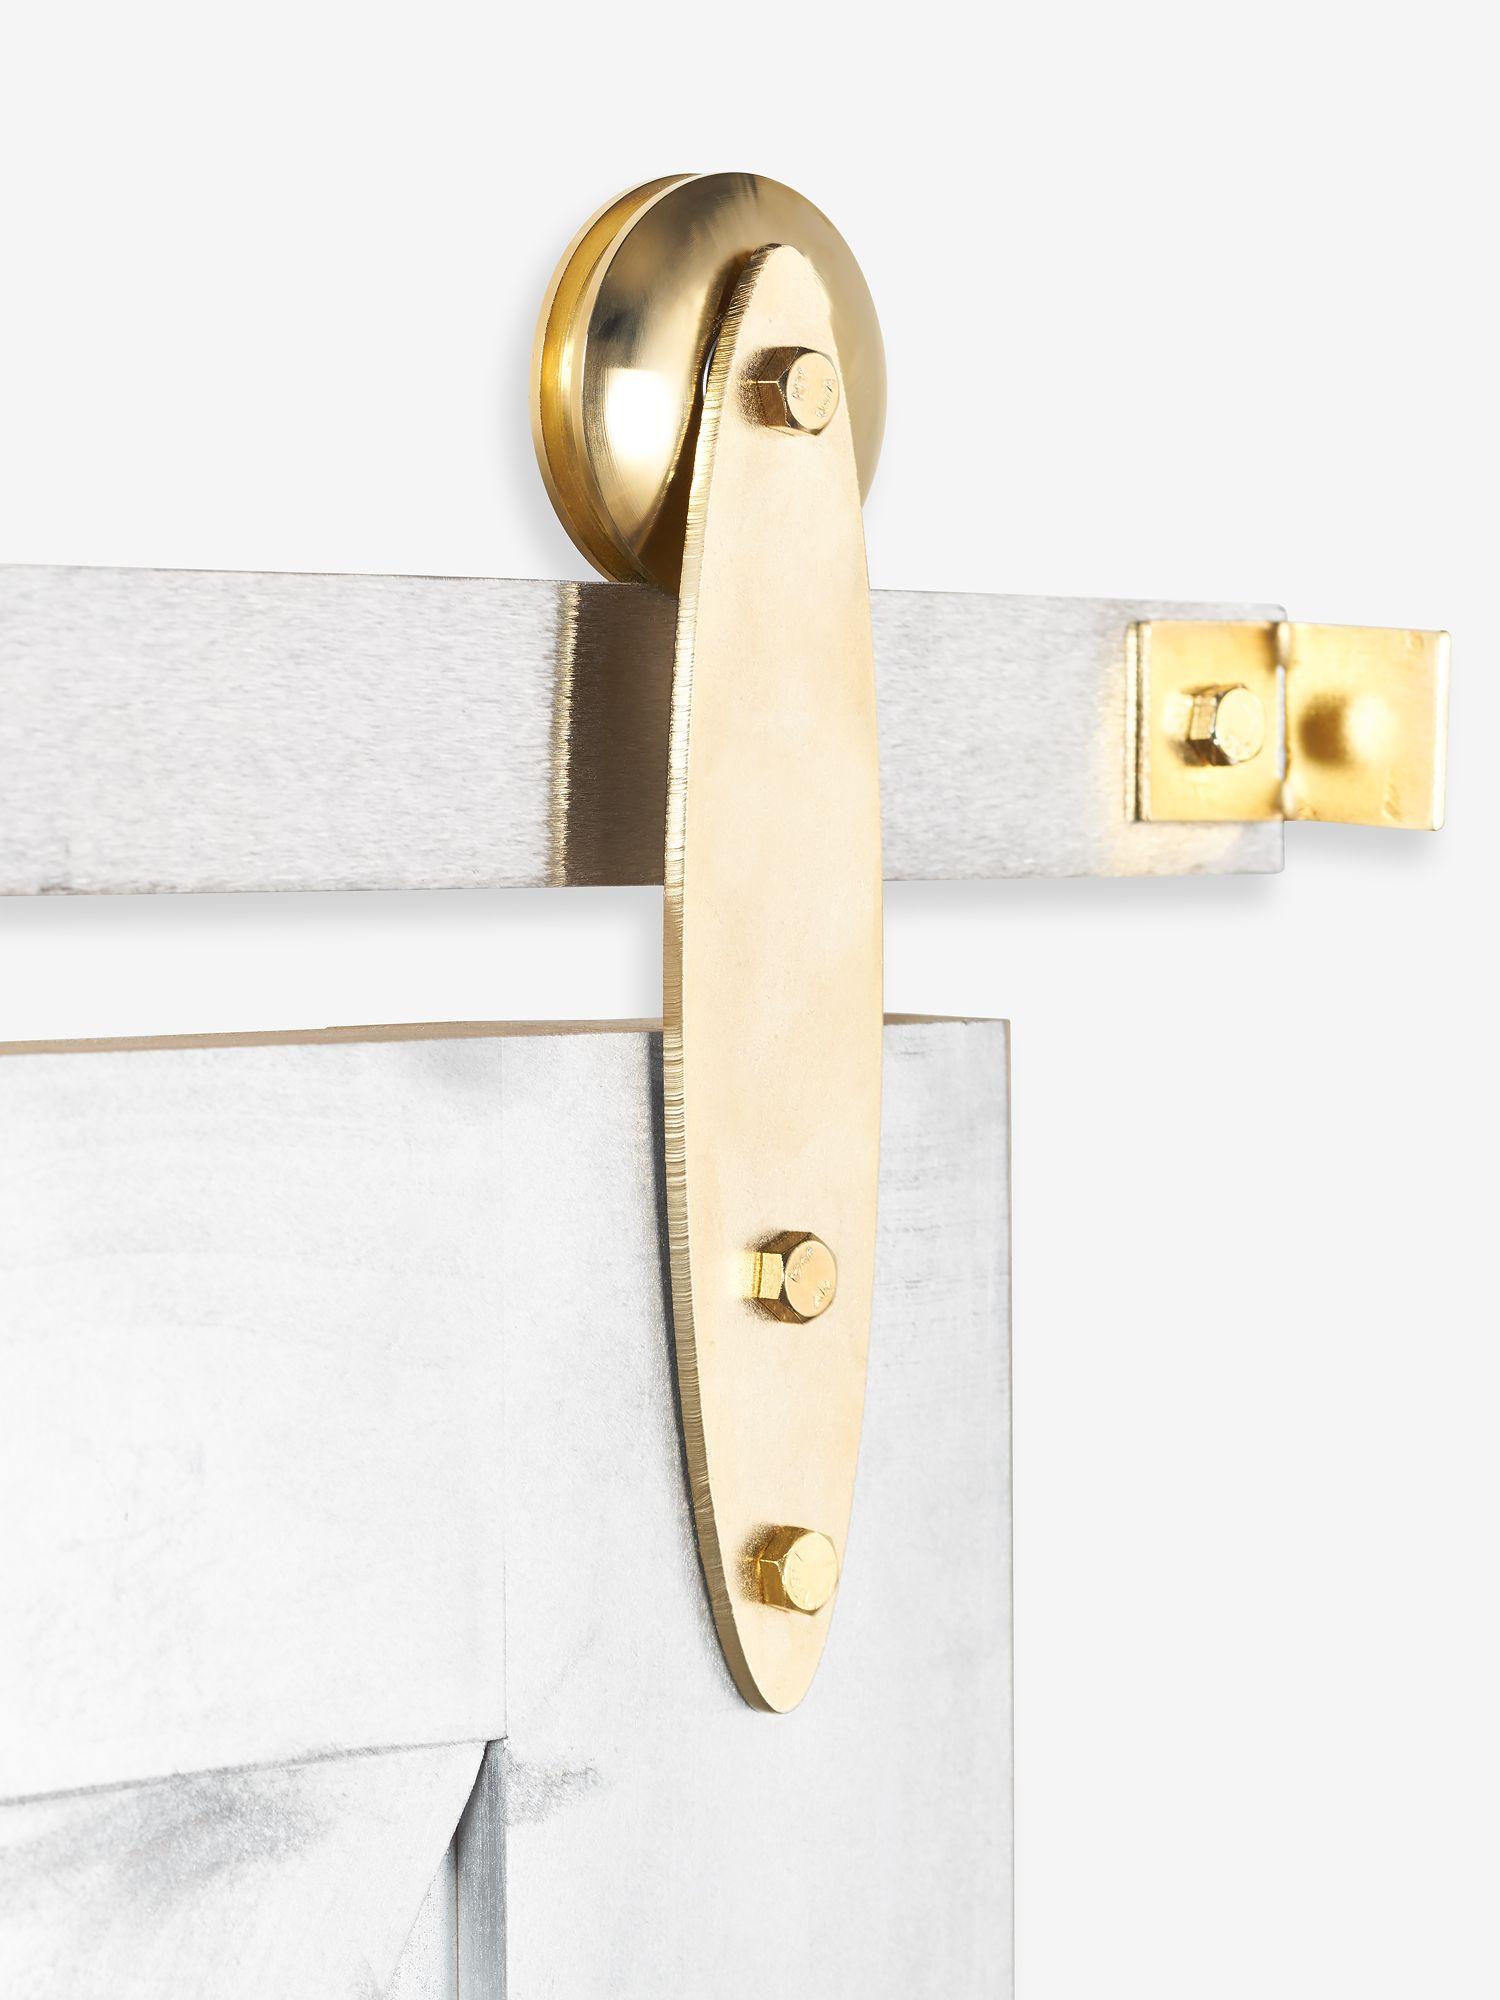 Gold Hardware Set The White Shanty Shoppe Interior Barn Door Hardware Sliding Doors Interior Sliding Barn Door Hardware